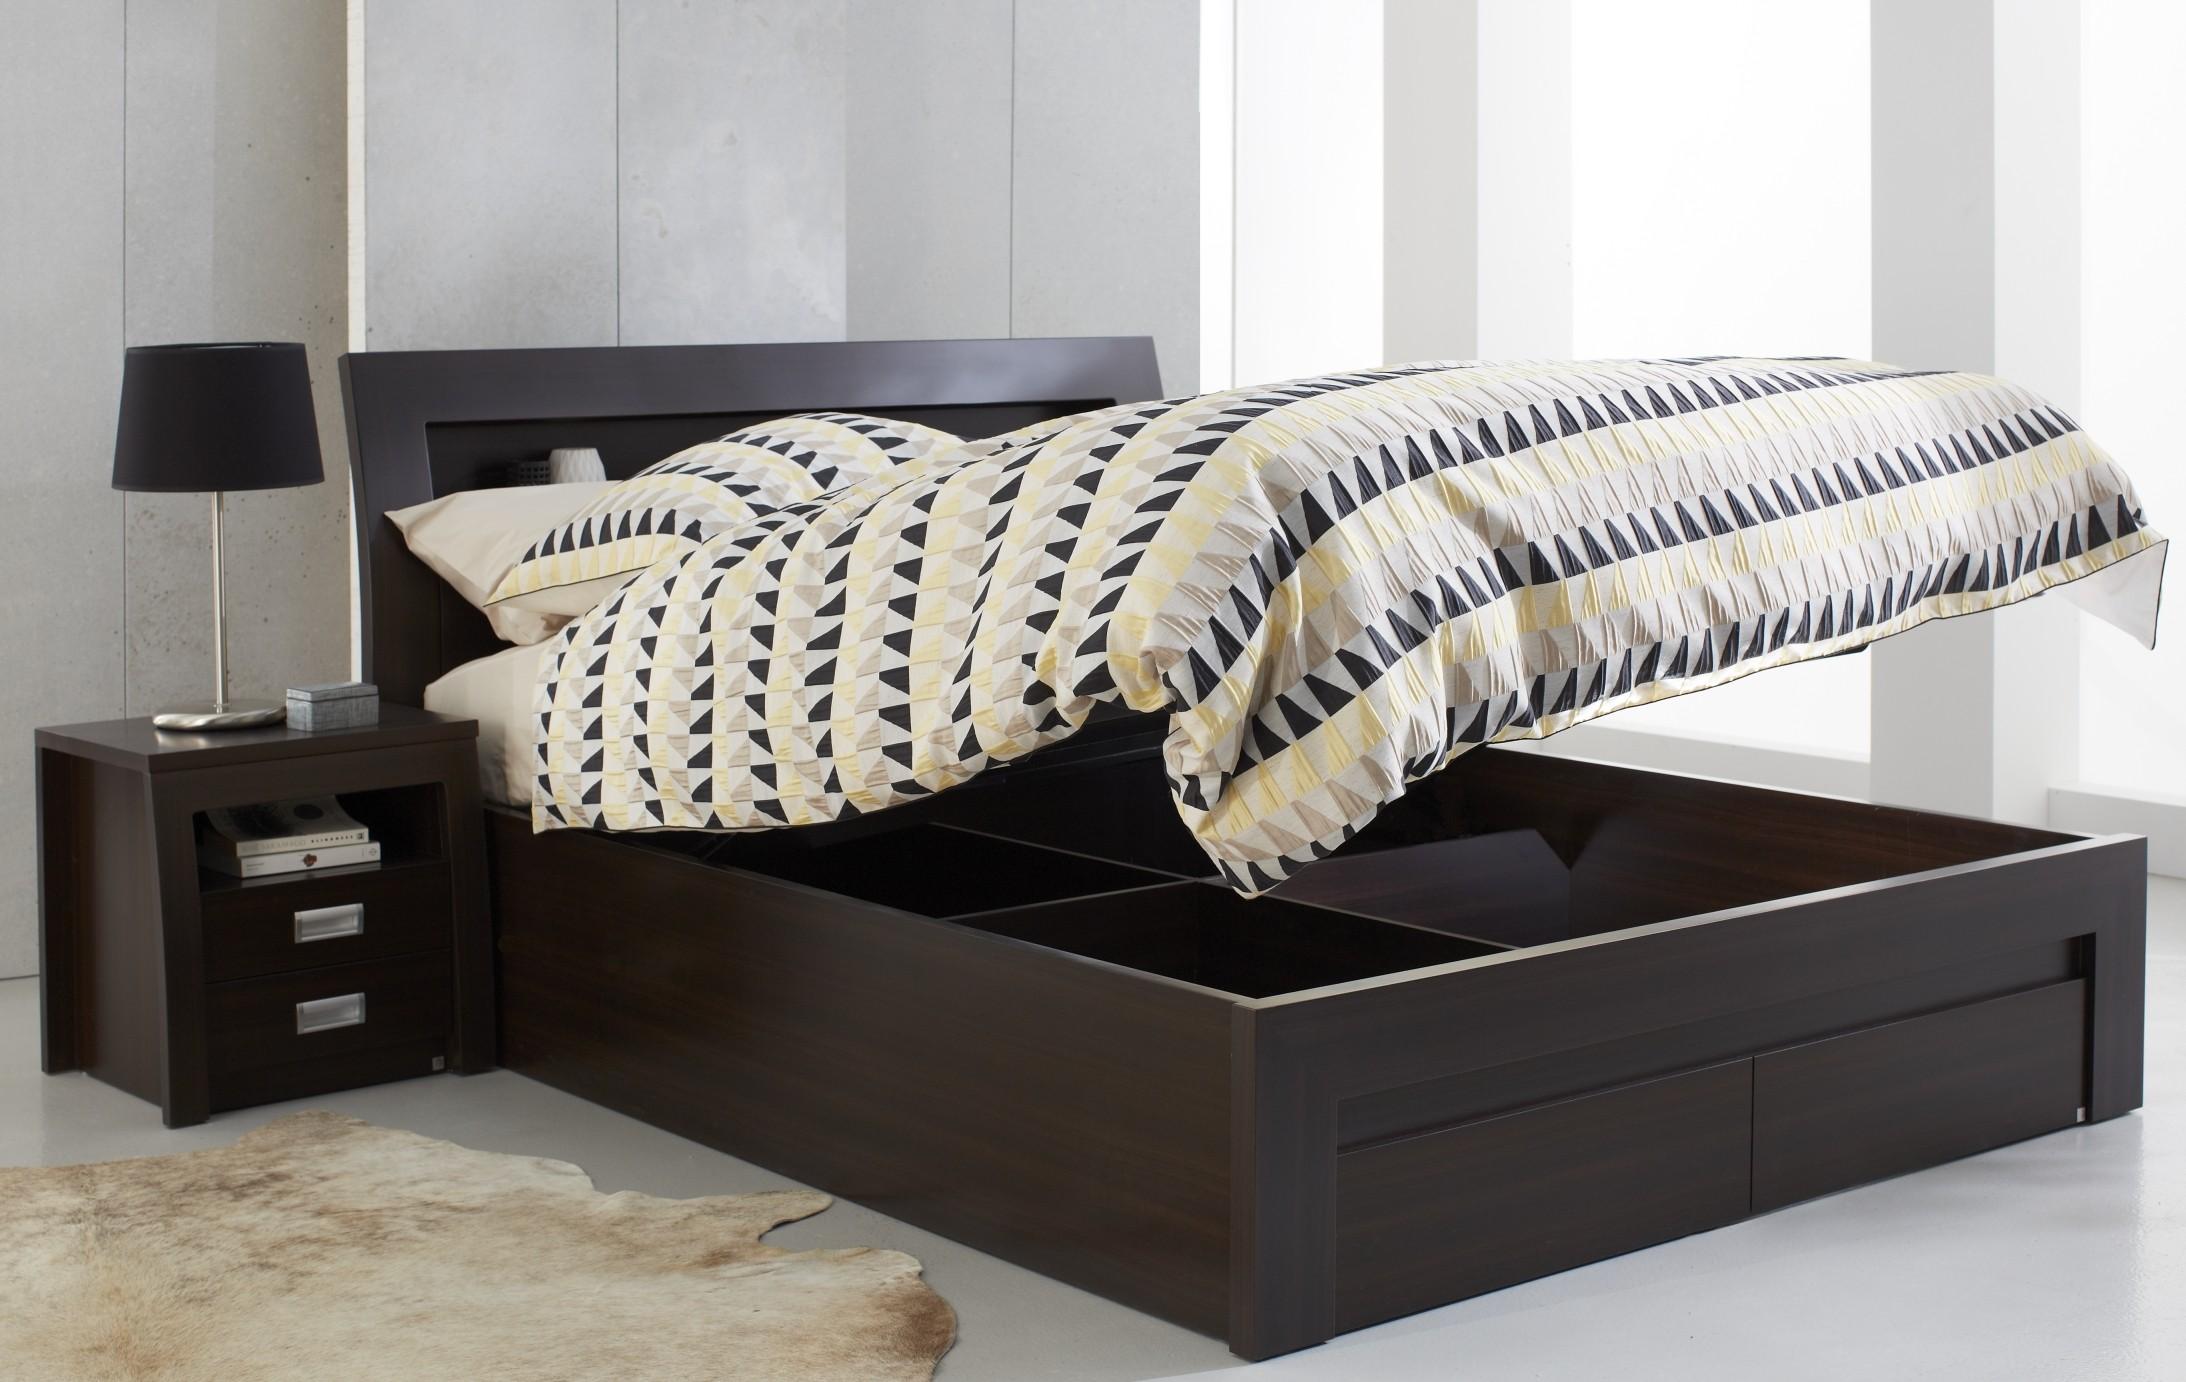 Nyc Bedroom Furniture Storage Beds Nyc Inspiration Homesfeed